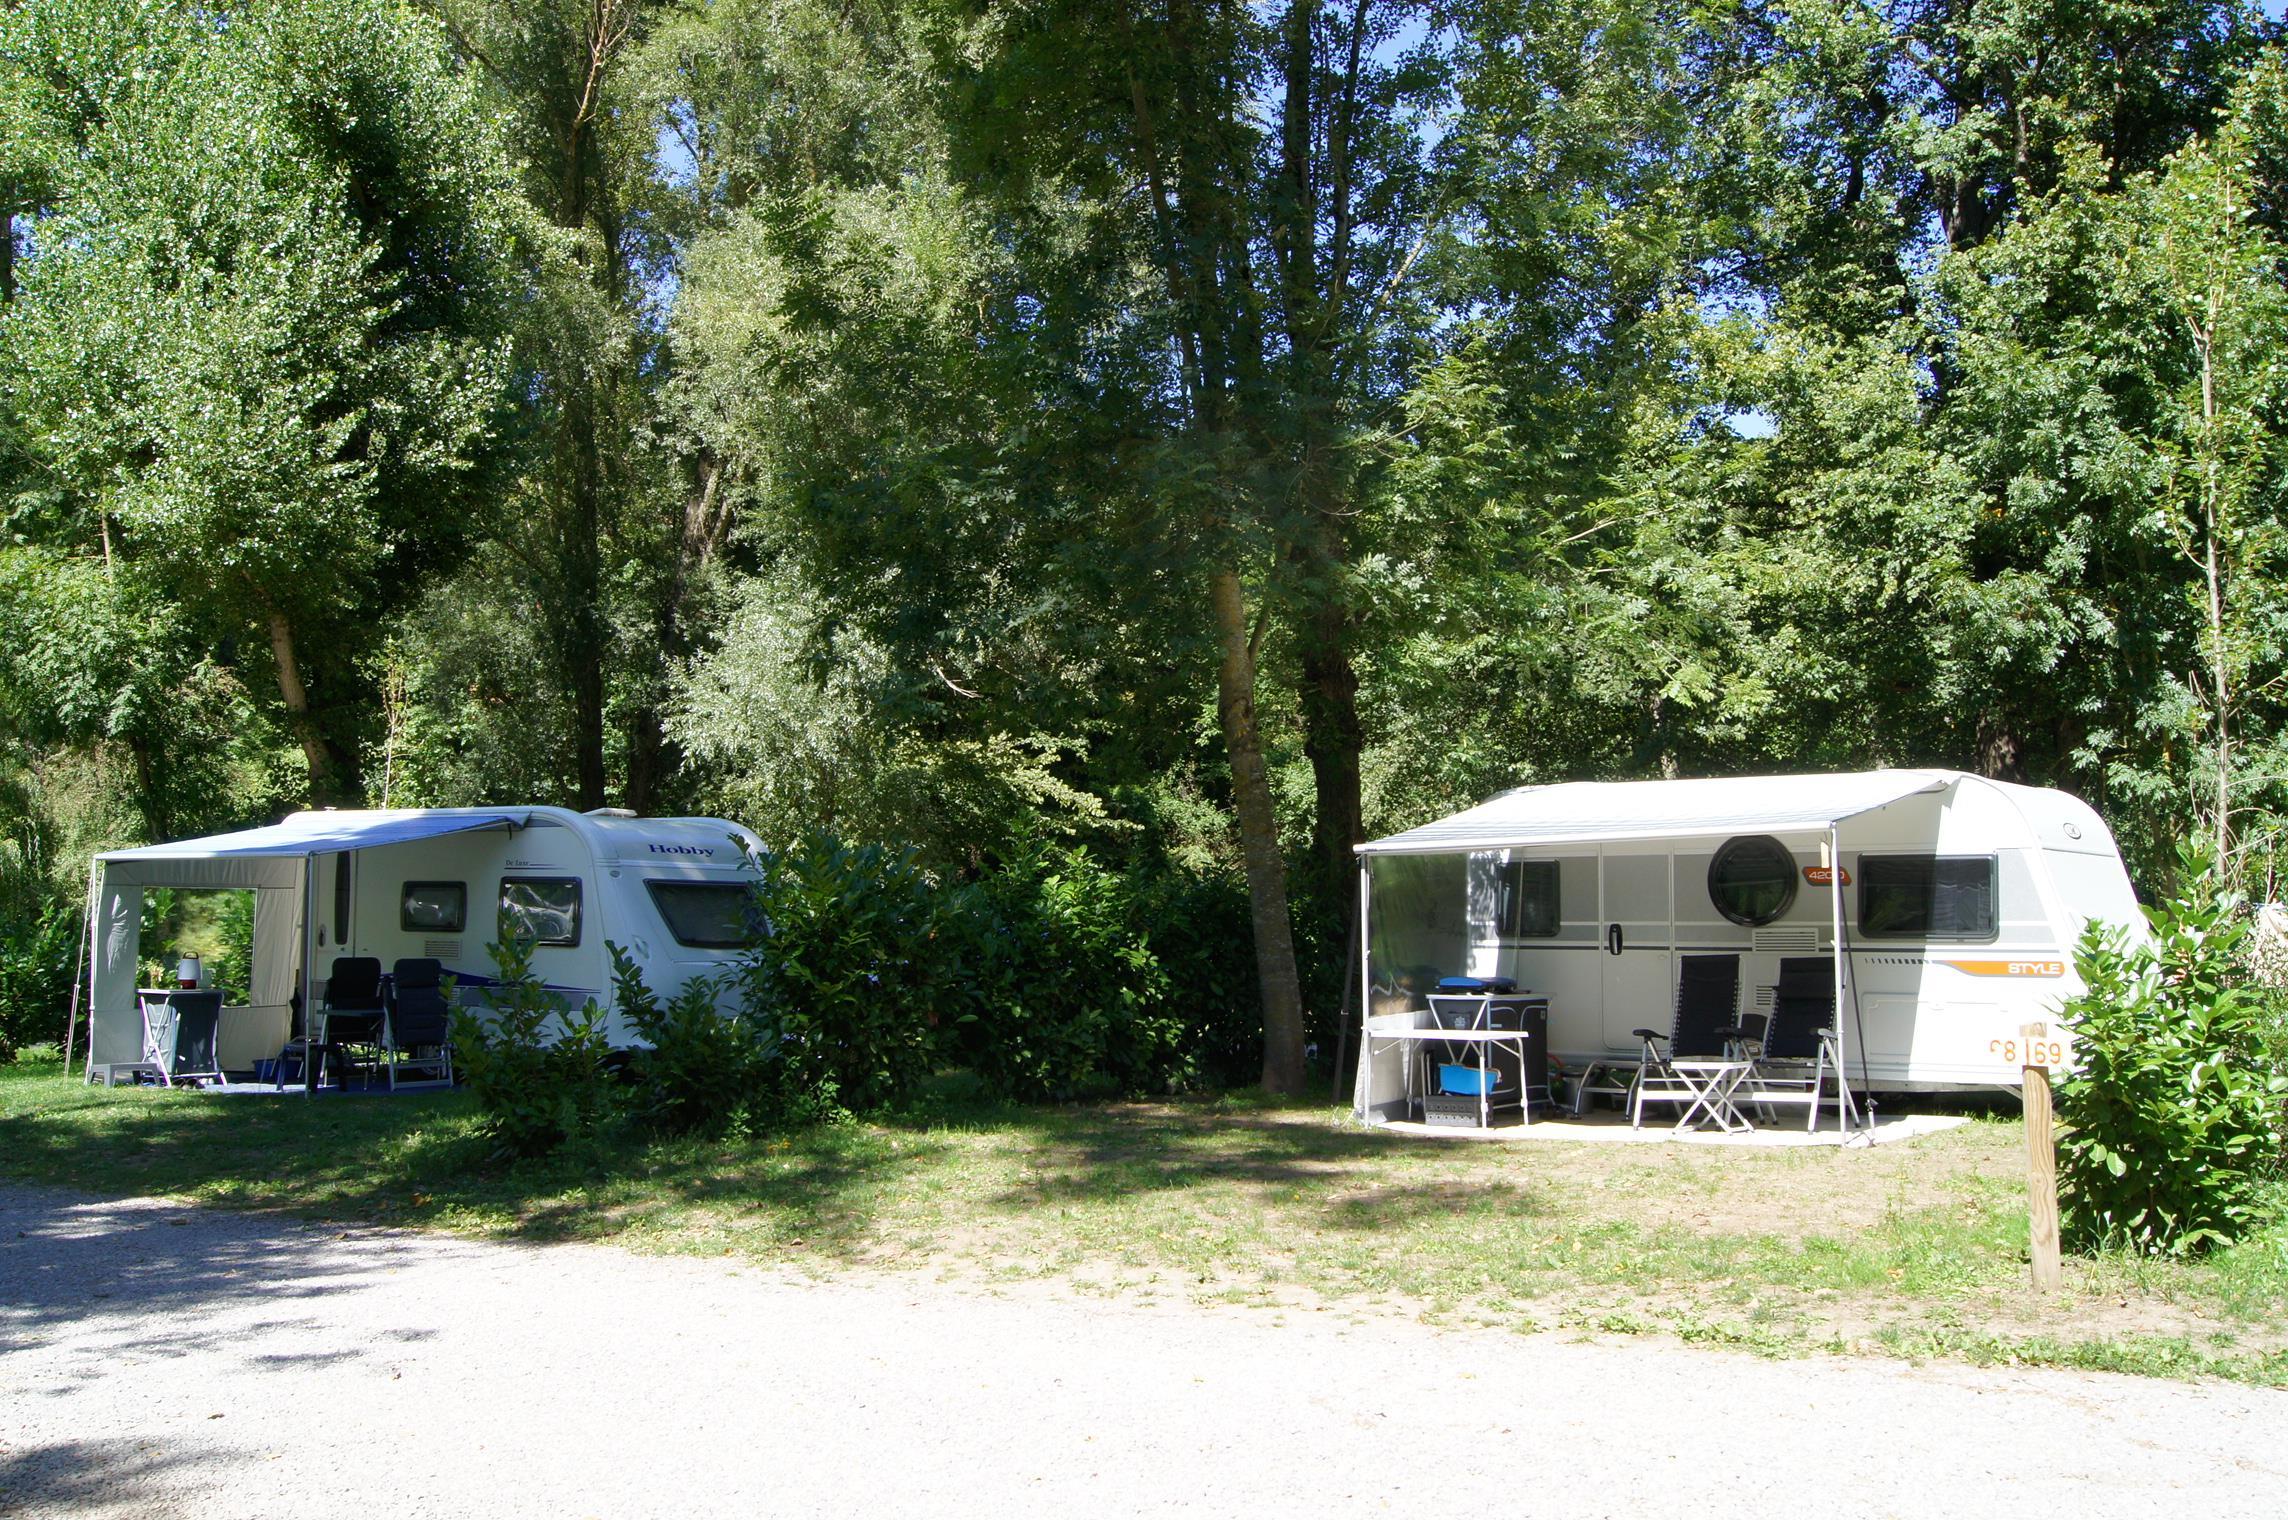 Camping les Bords du Tarn, Mostuéjouls, Aveyron